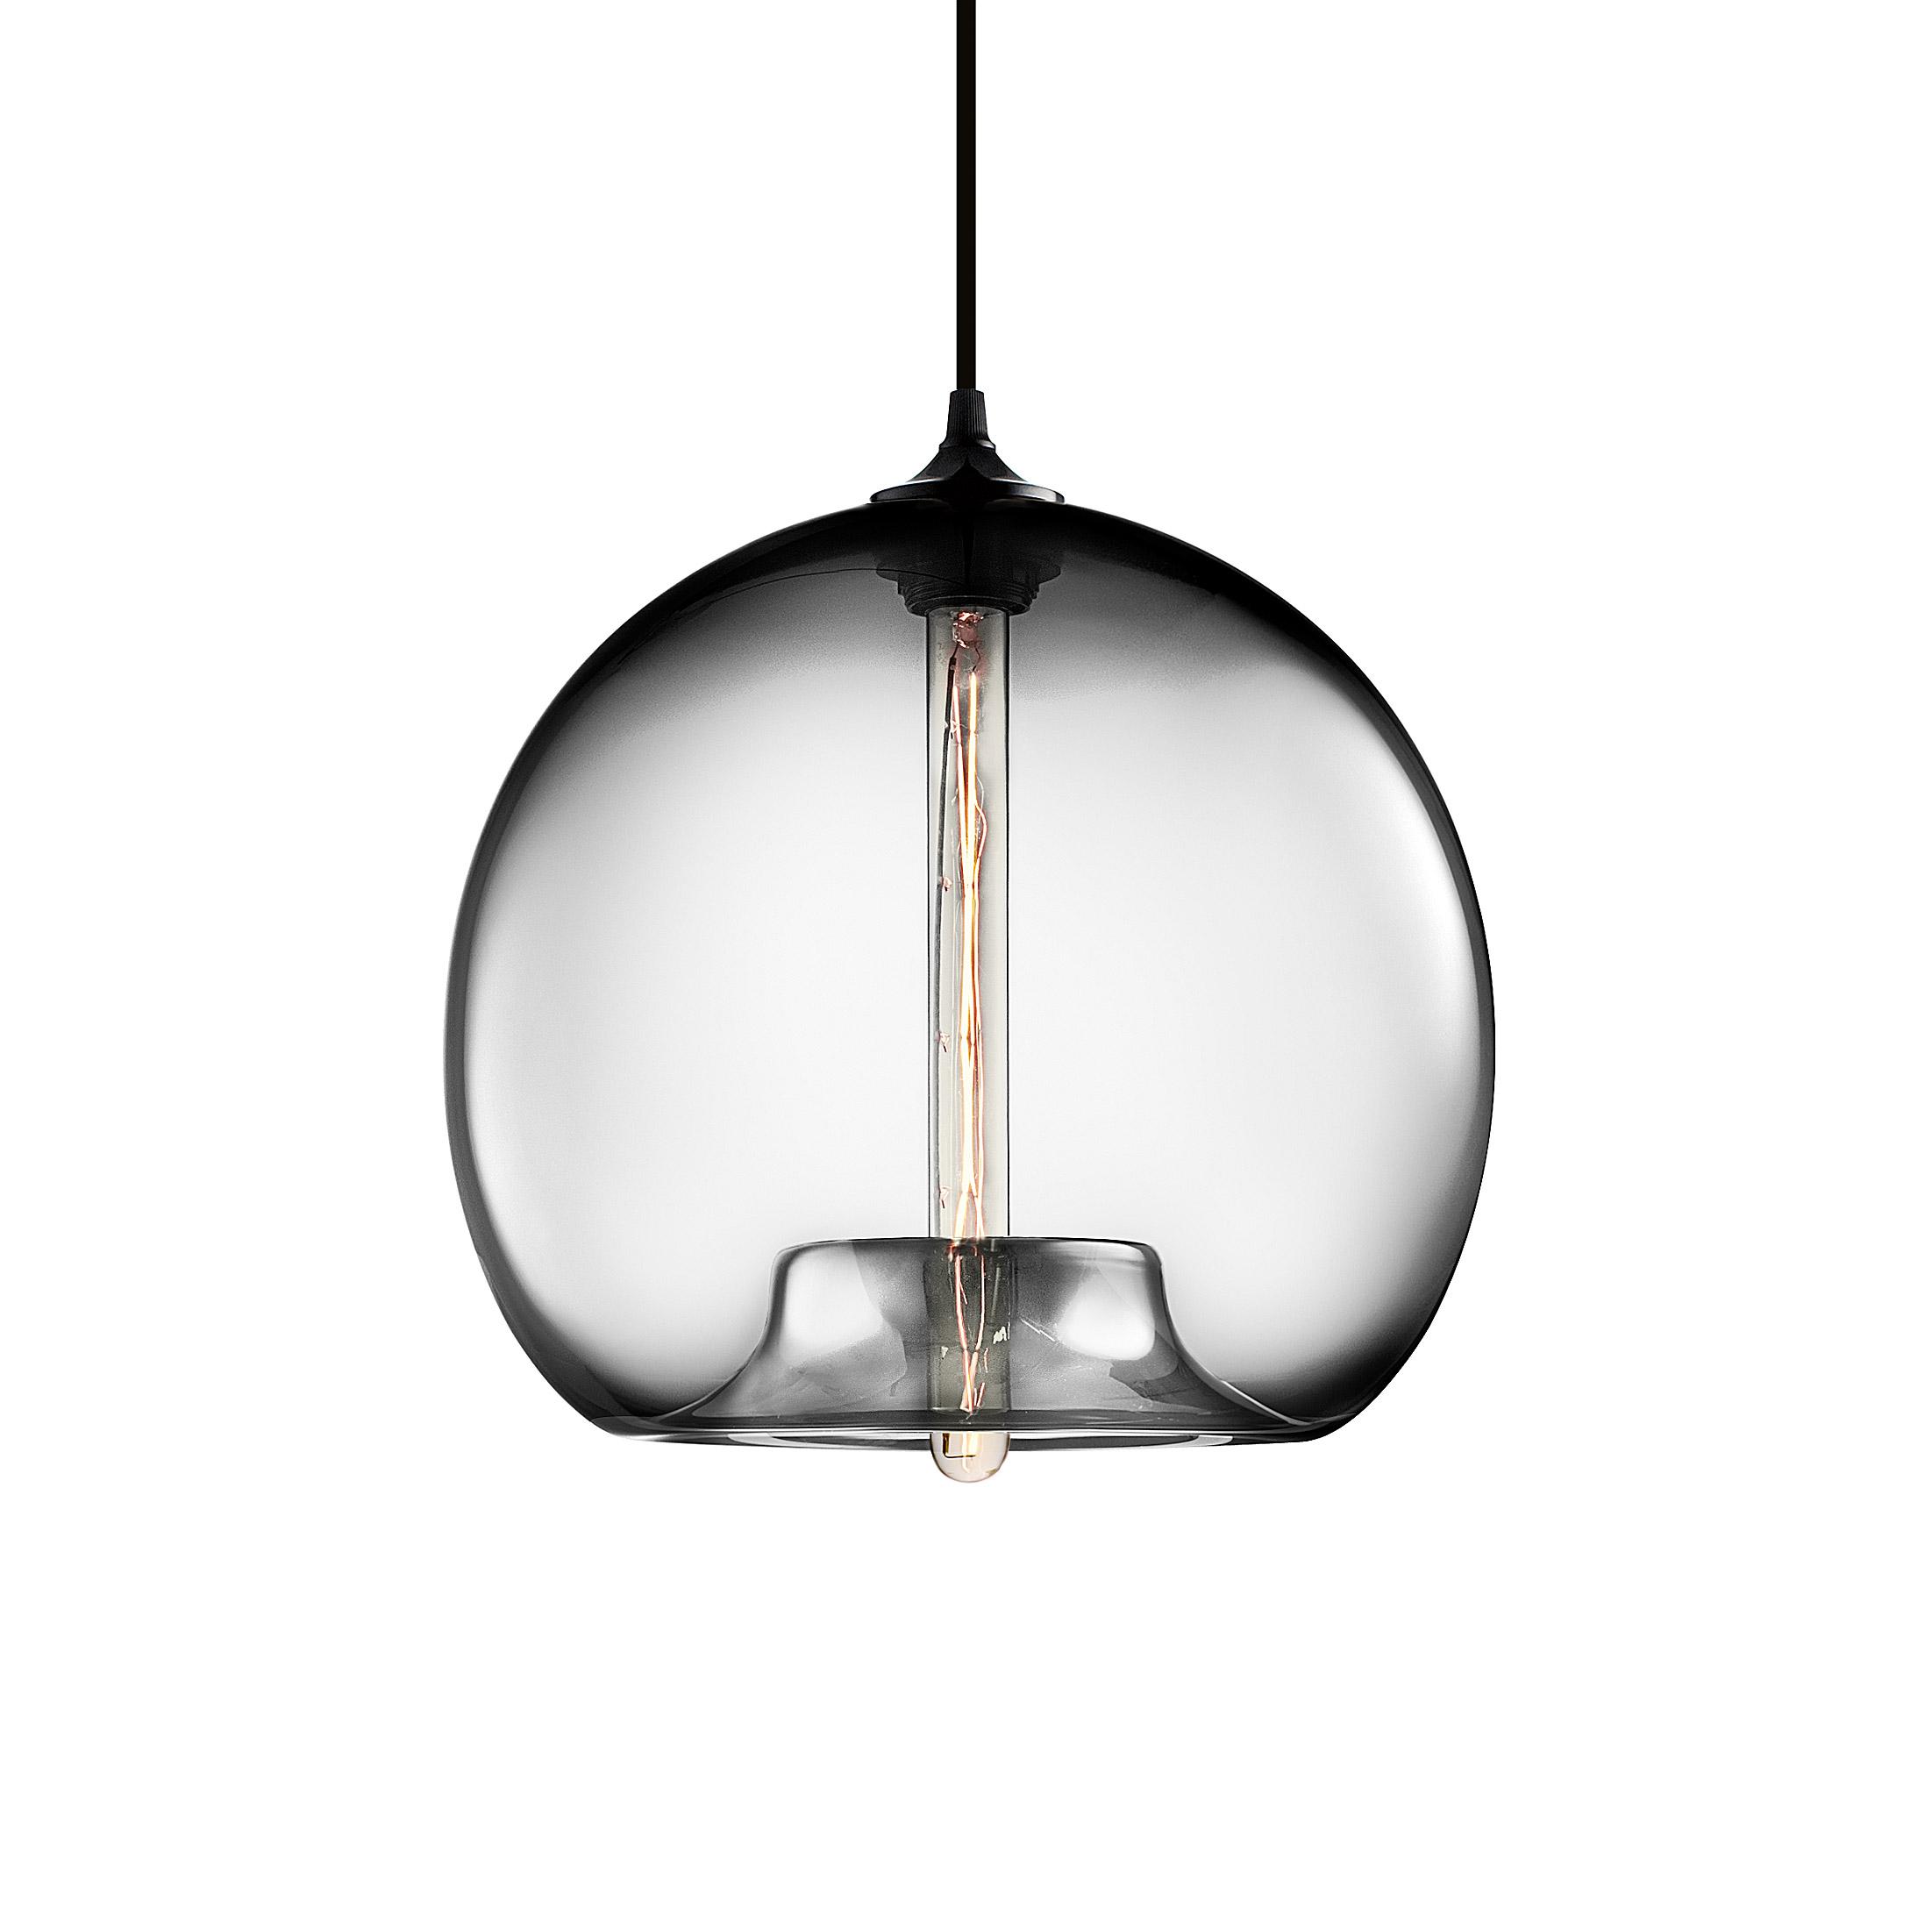 Stamen pendant light by niche modern archello aloadofball Choice Image